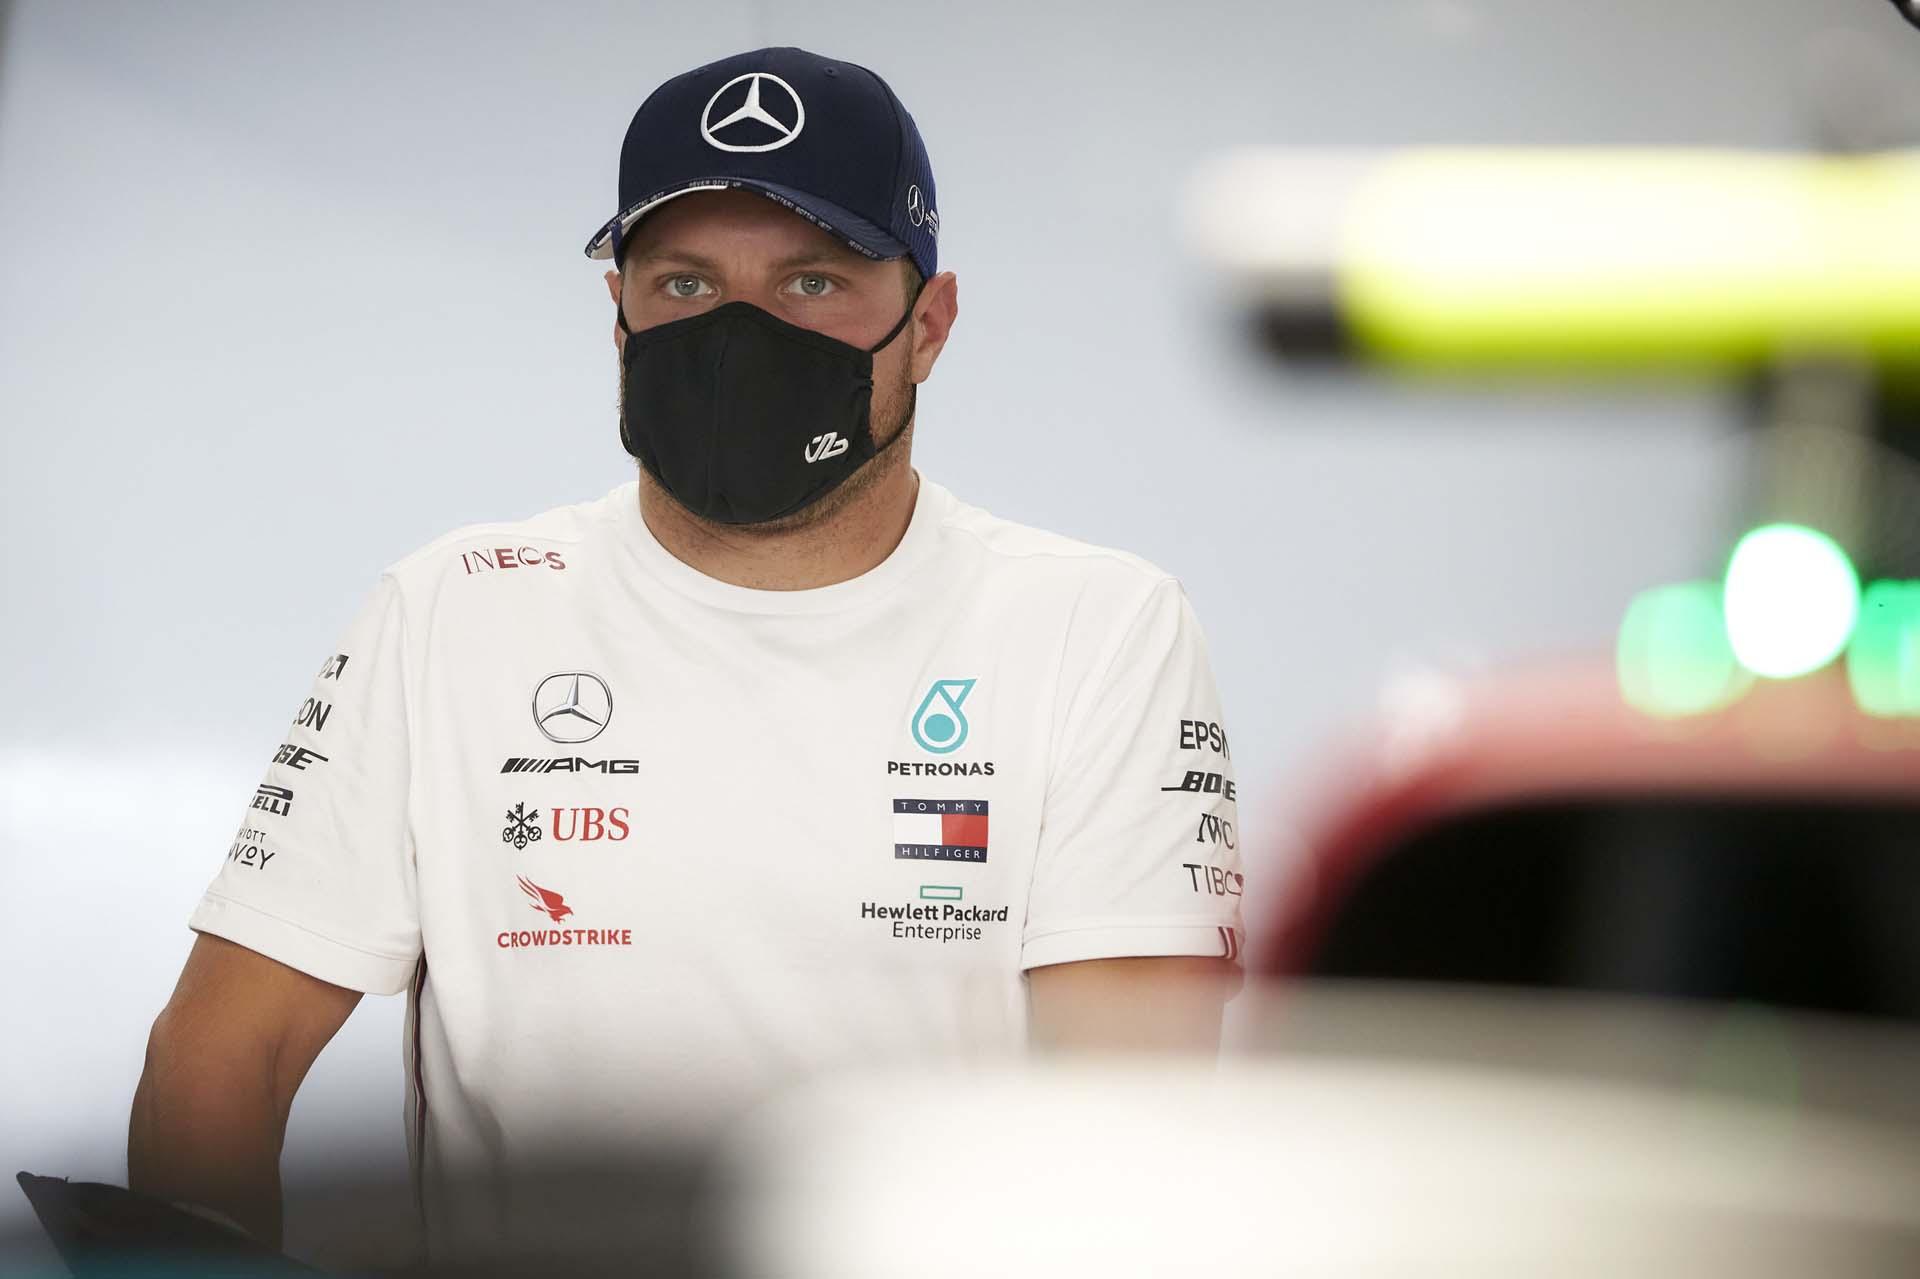 2020 Russian Grand Prix, Thursday - Steve Etherington